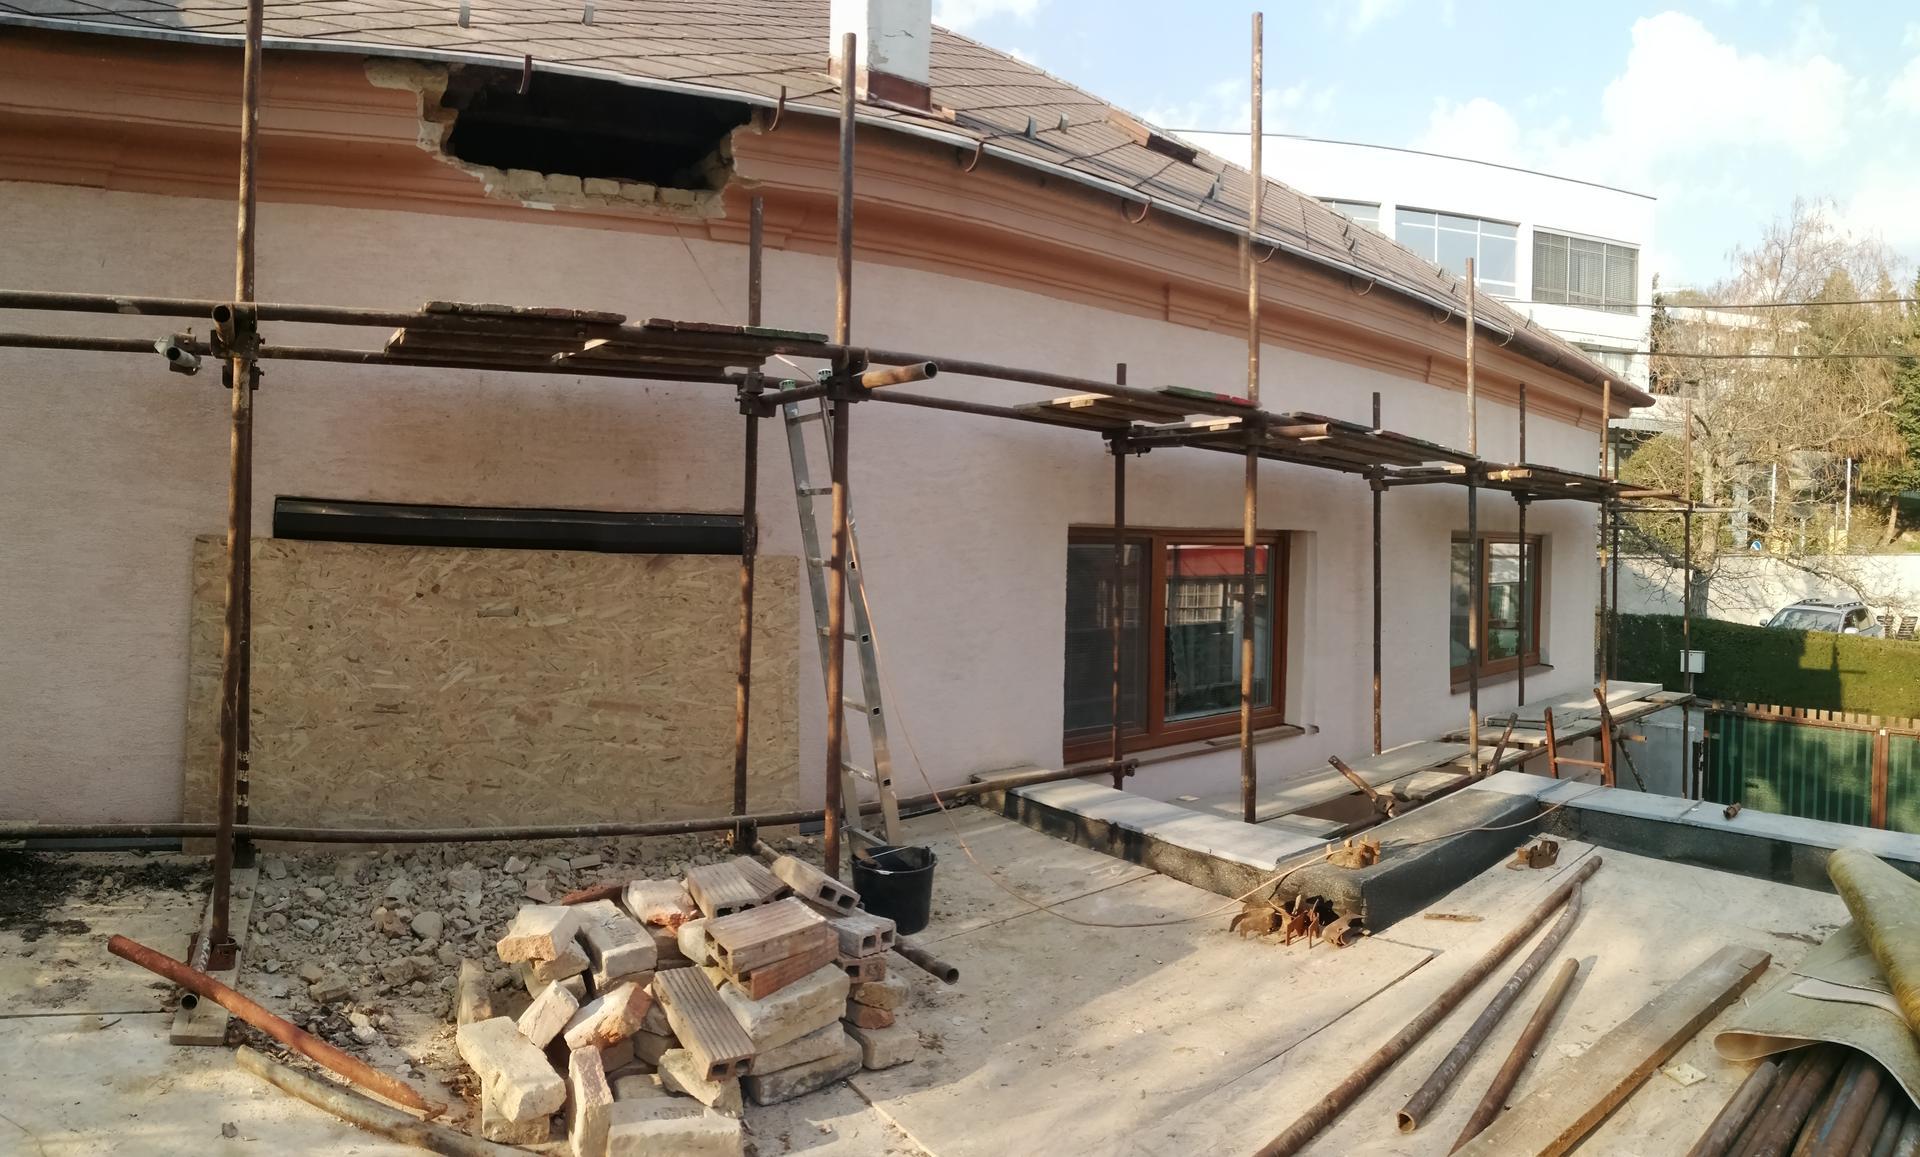 Prestavba podkrovia zo sedlovo valbovej na sedlovú strechu. - Obrázok č. 27